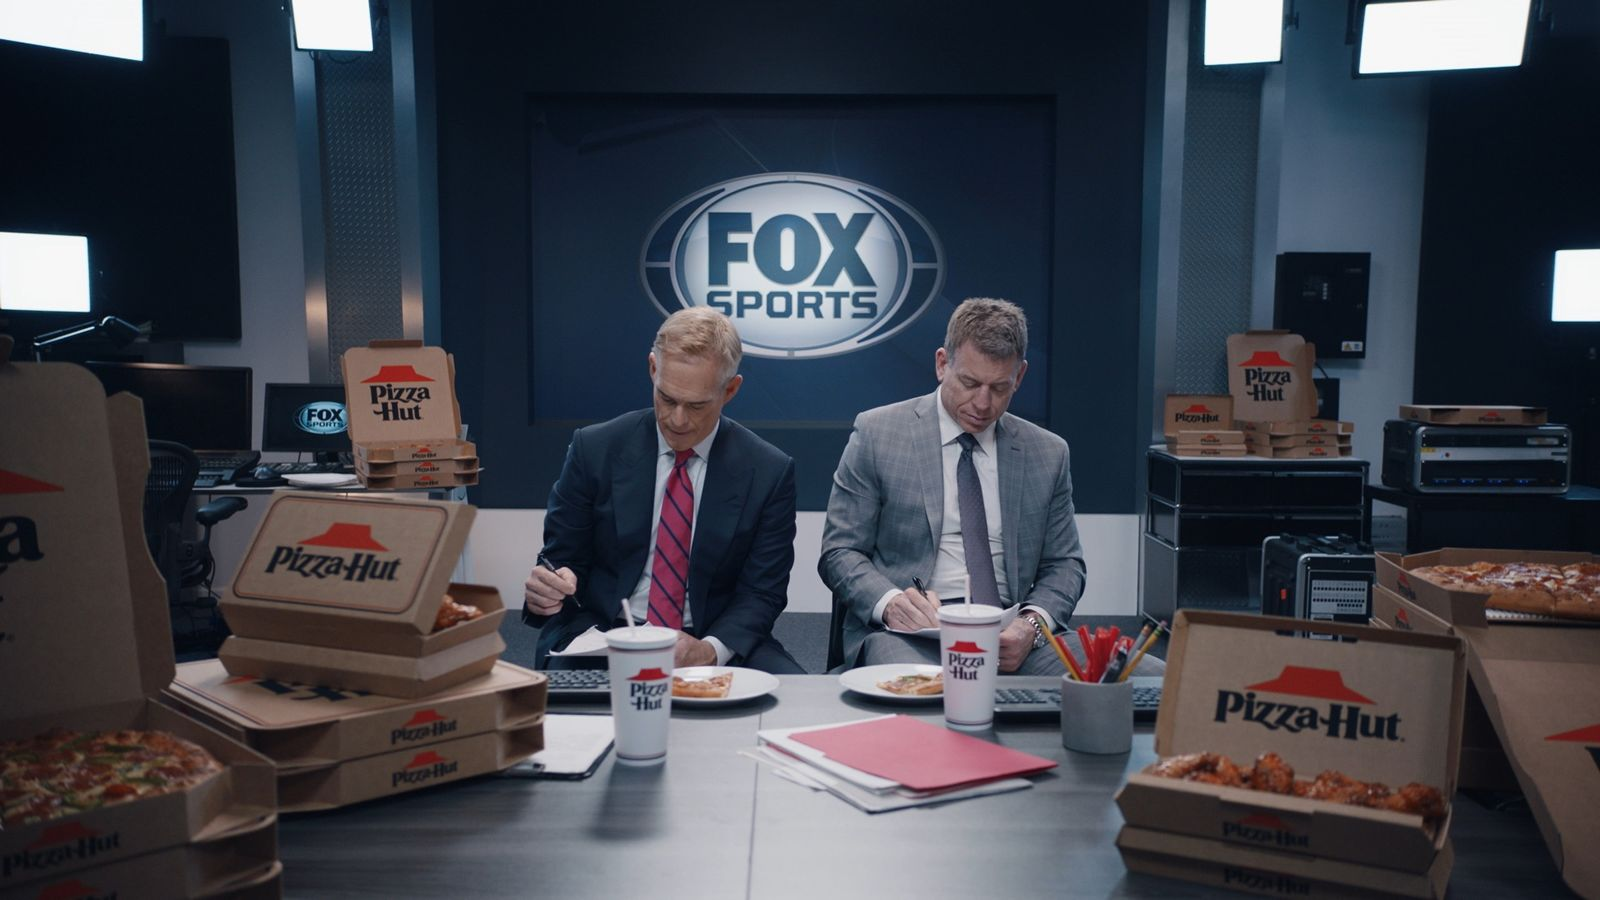 Pizza Hut Preps to Bring the Heat for Super Bowl LIV